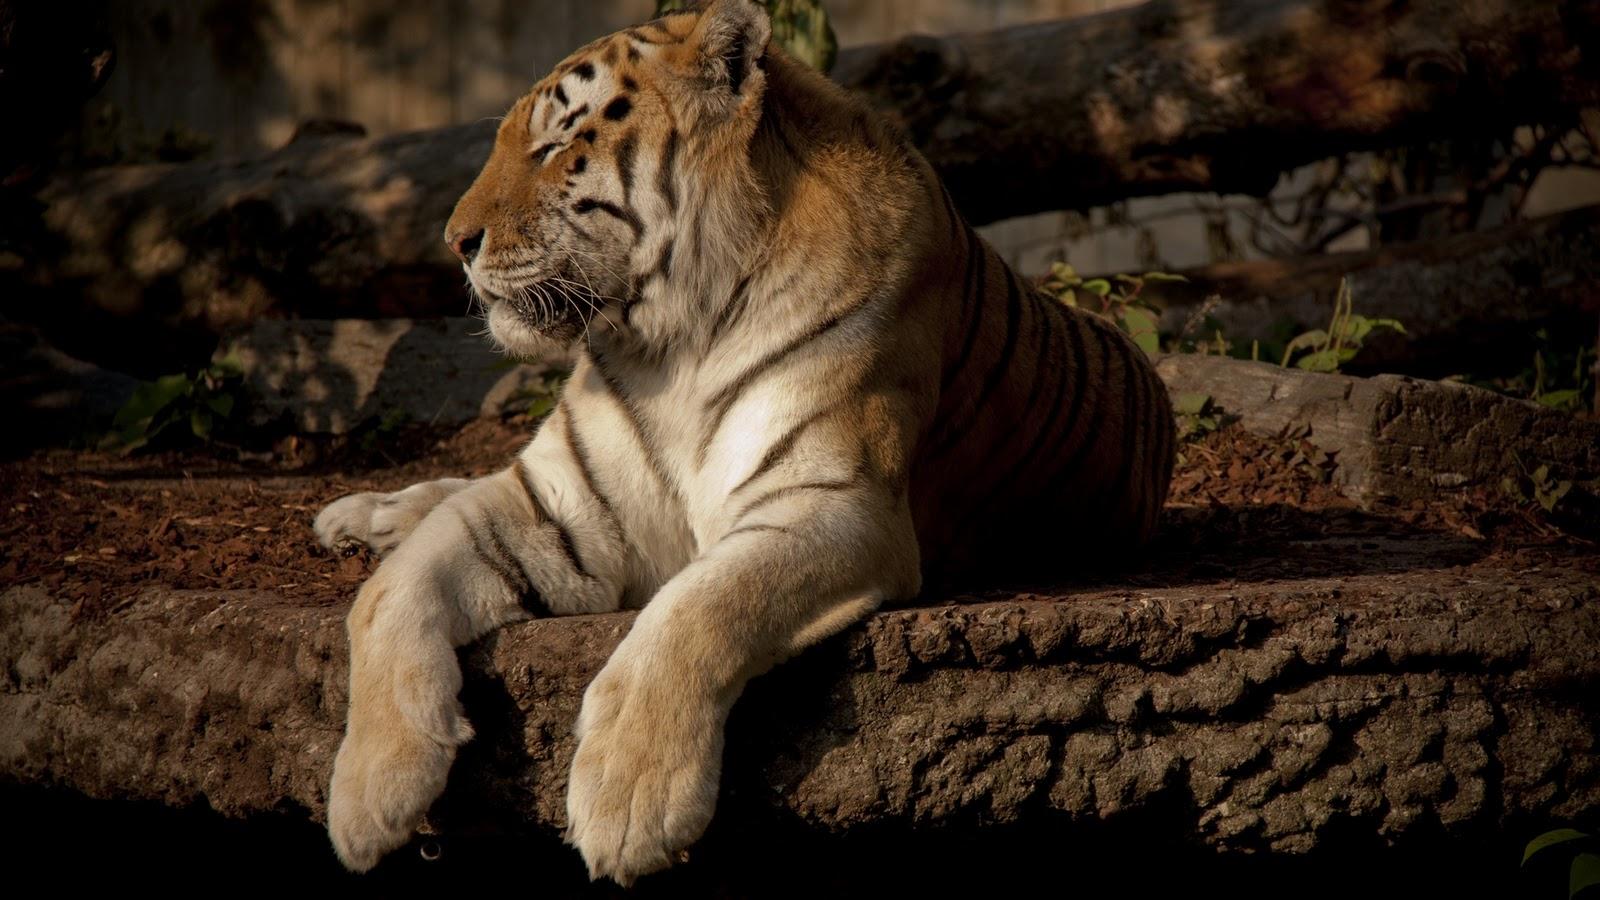 Tiger Hd Wallpapers: Desktop Wallapers